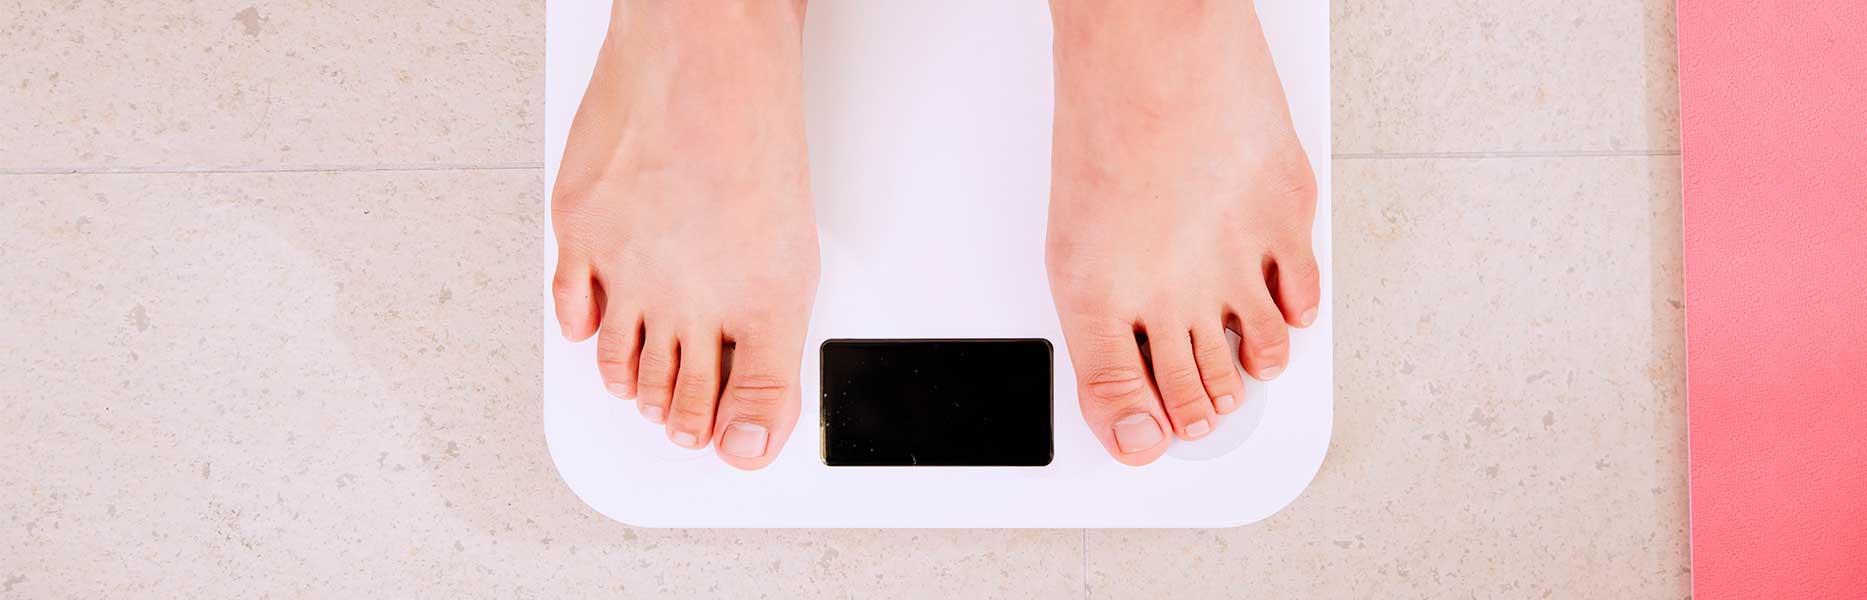 obesidad-operacion